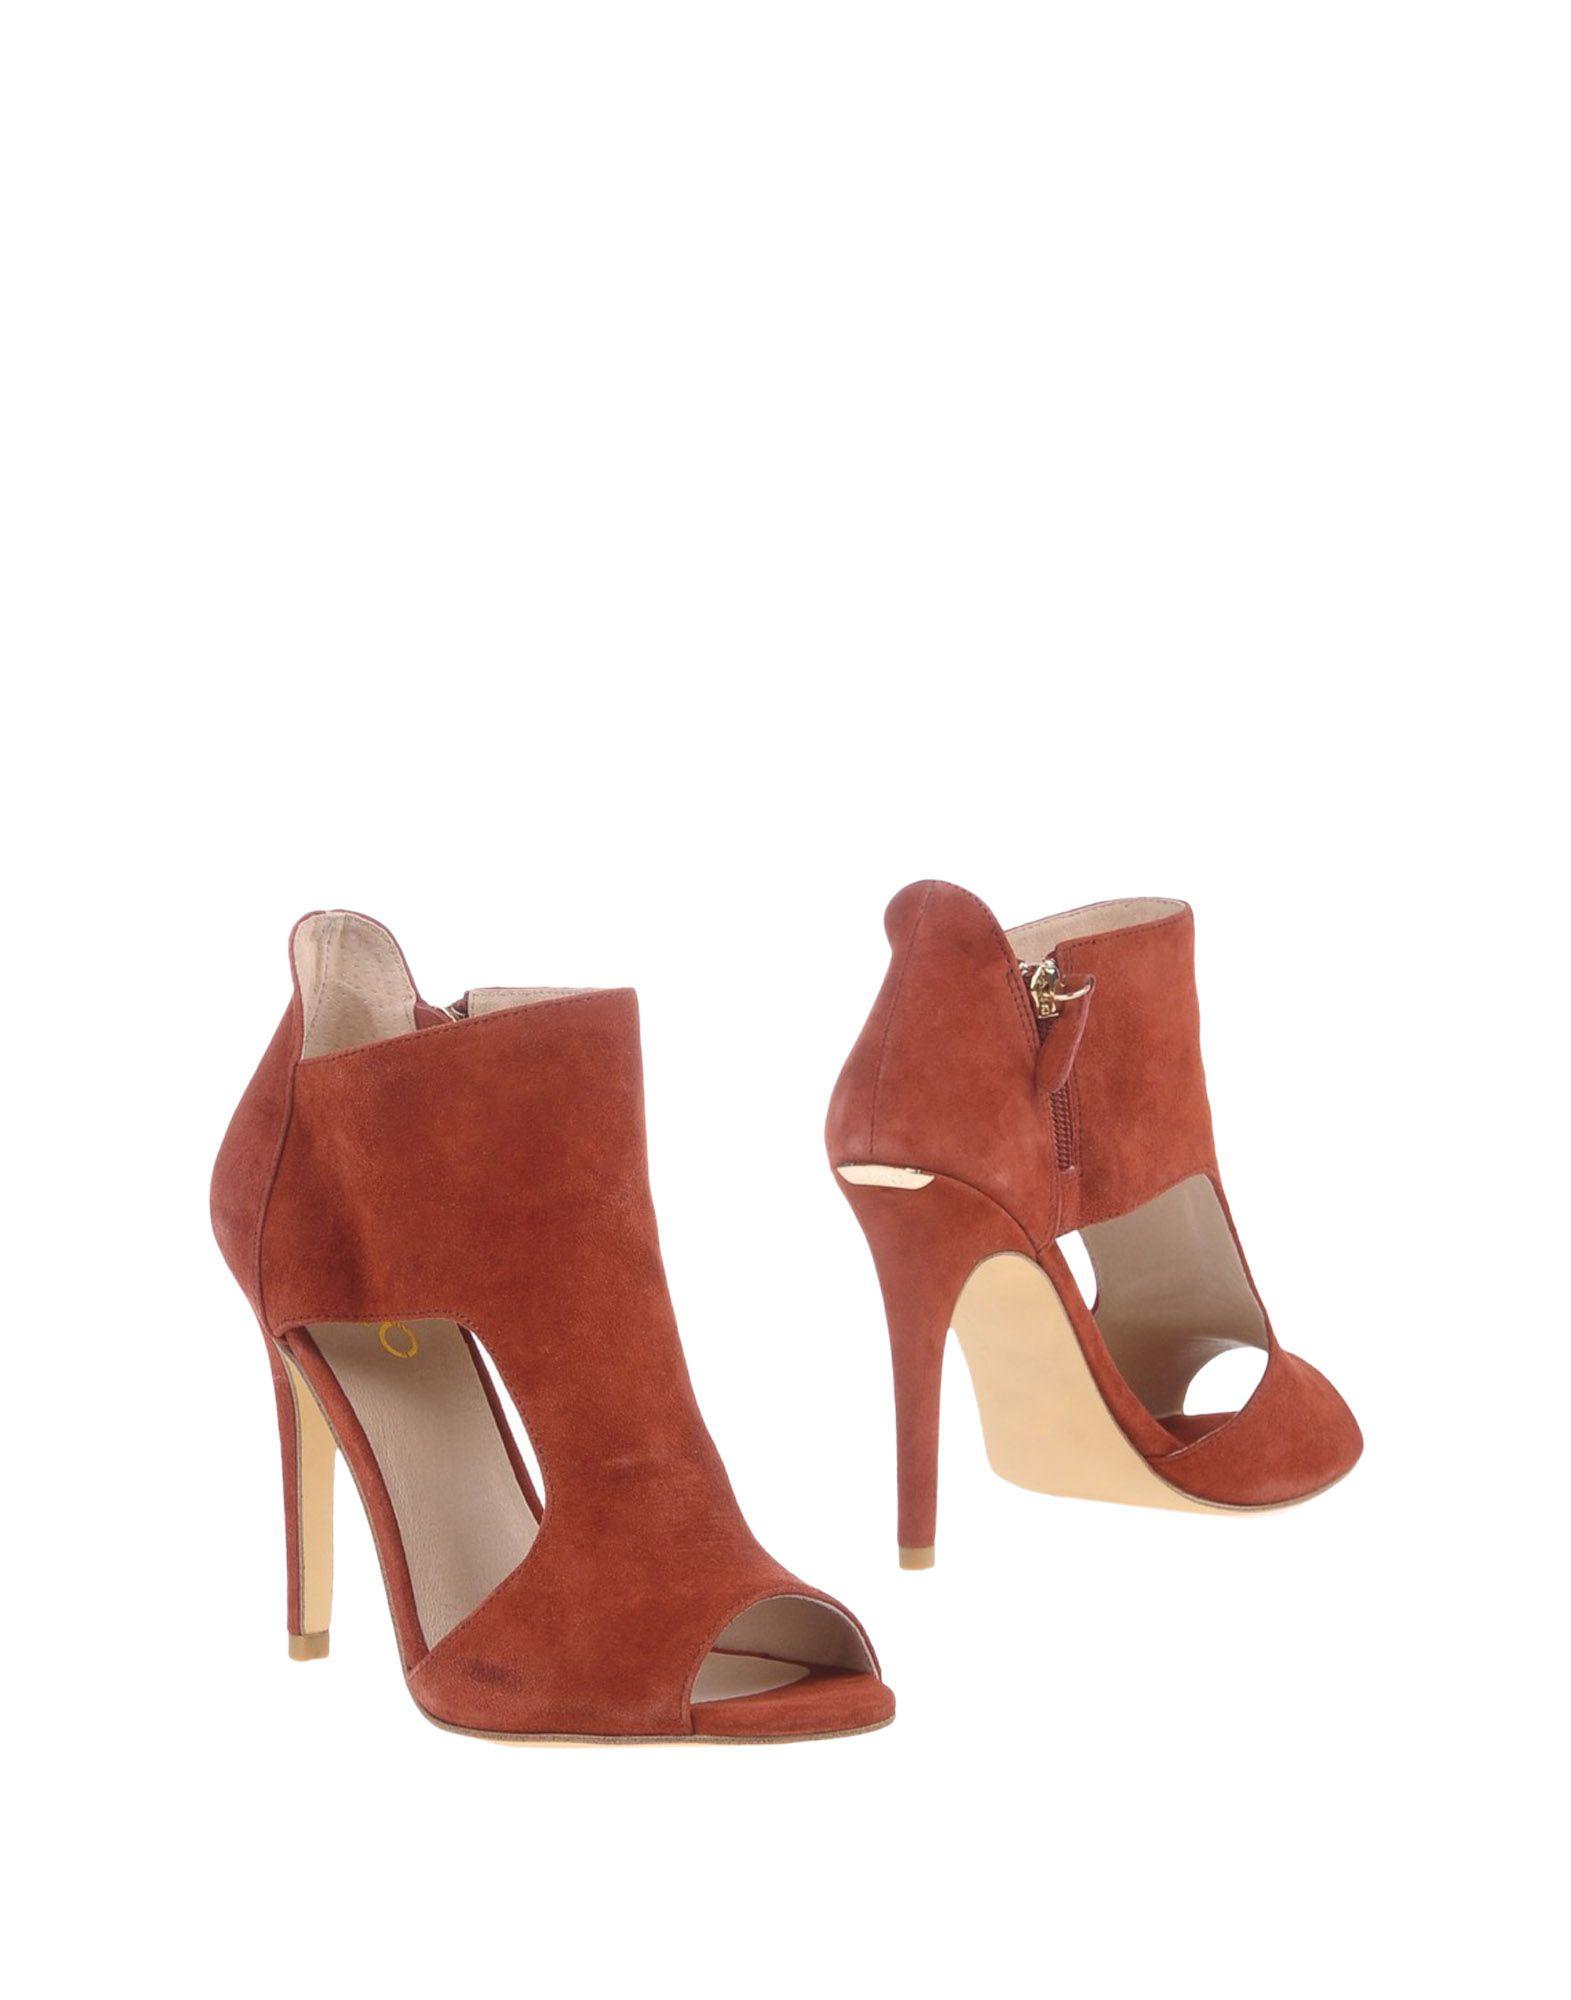 Liu •Jo Shoes Stiefelette Damen  11342681XA Gute Qualität beliebte Schuhe